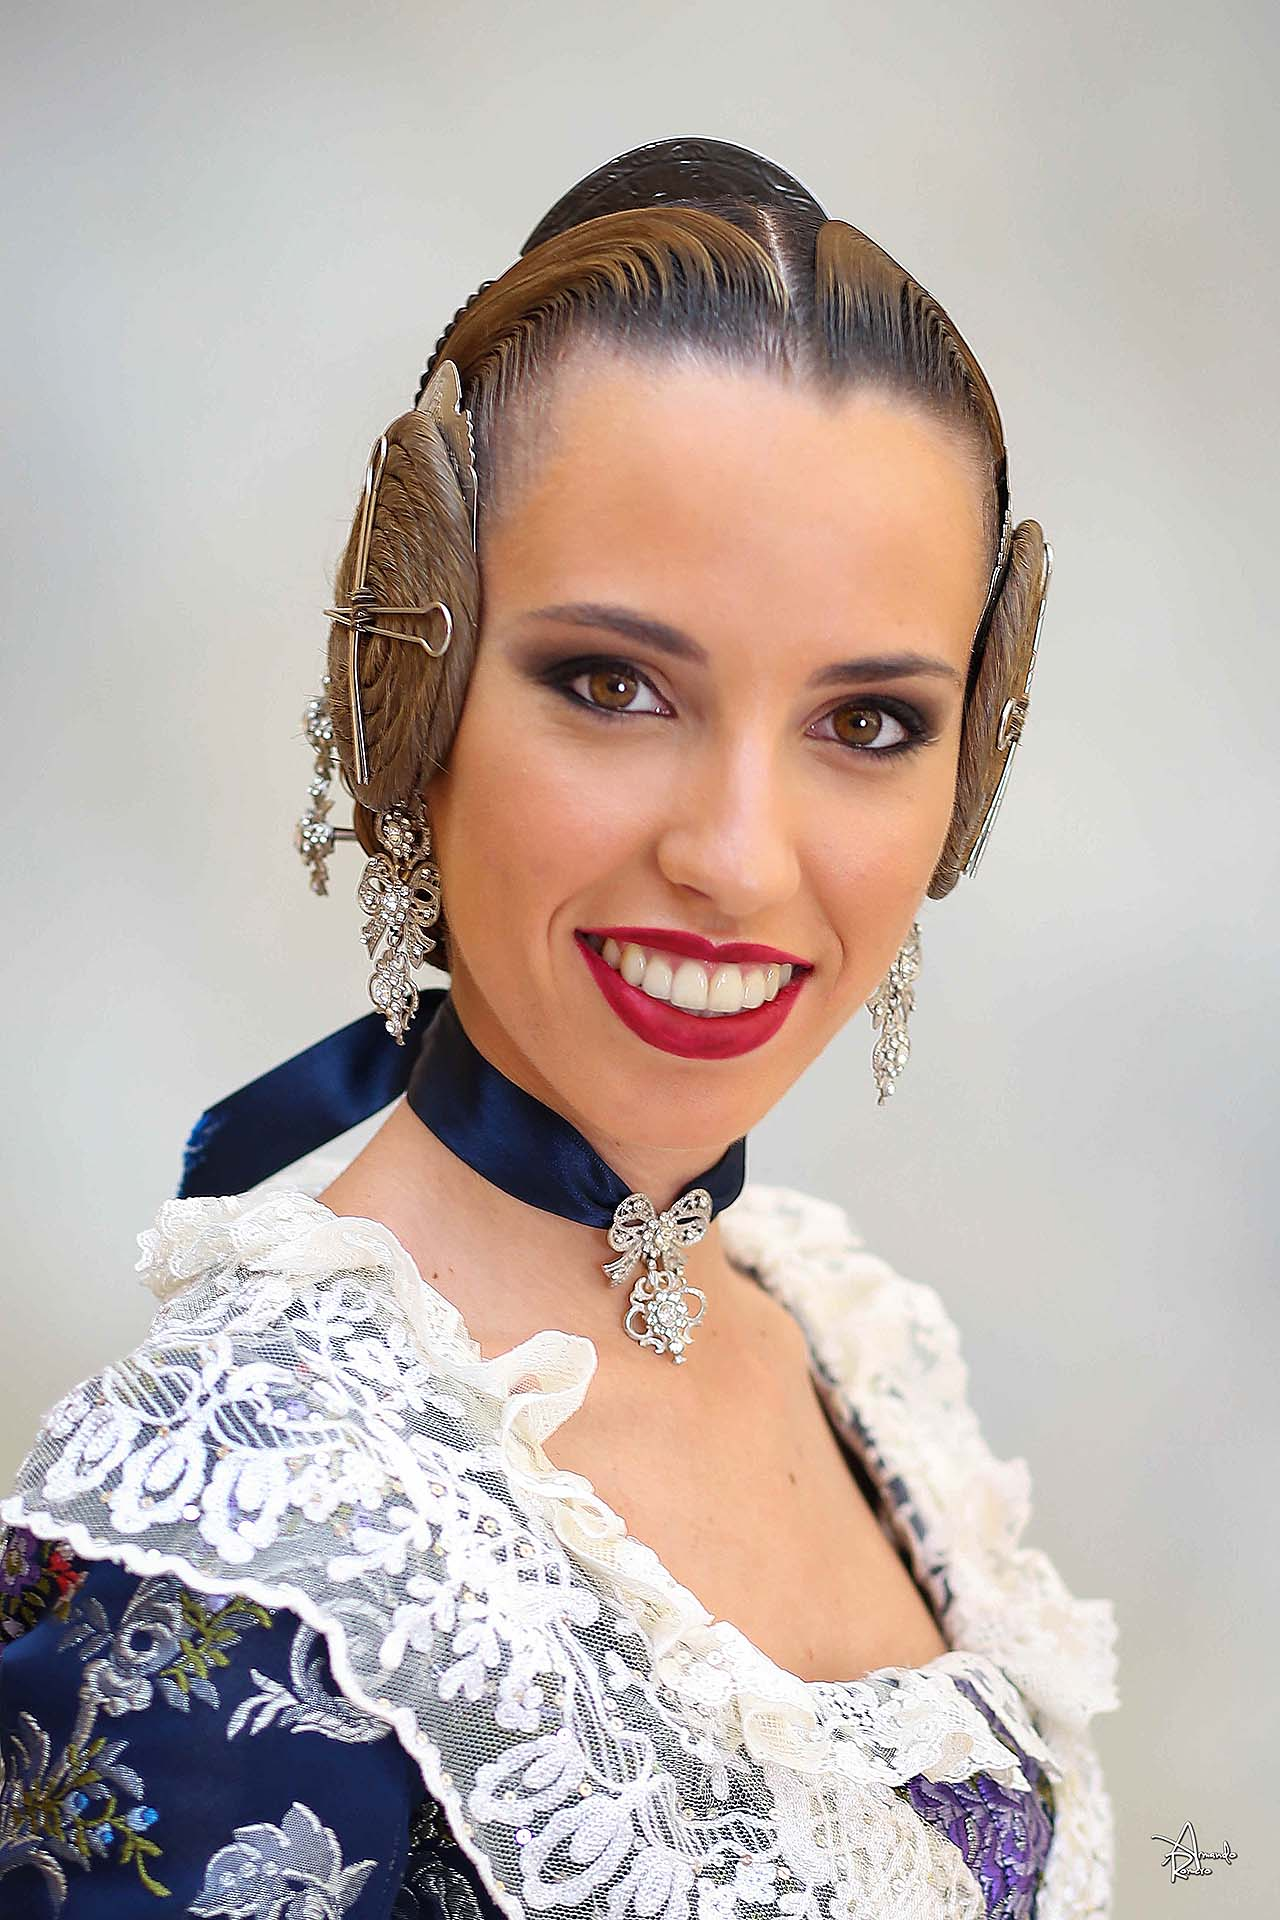 Raquel Avivar Pardo